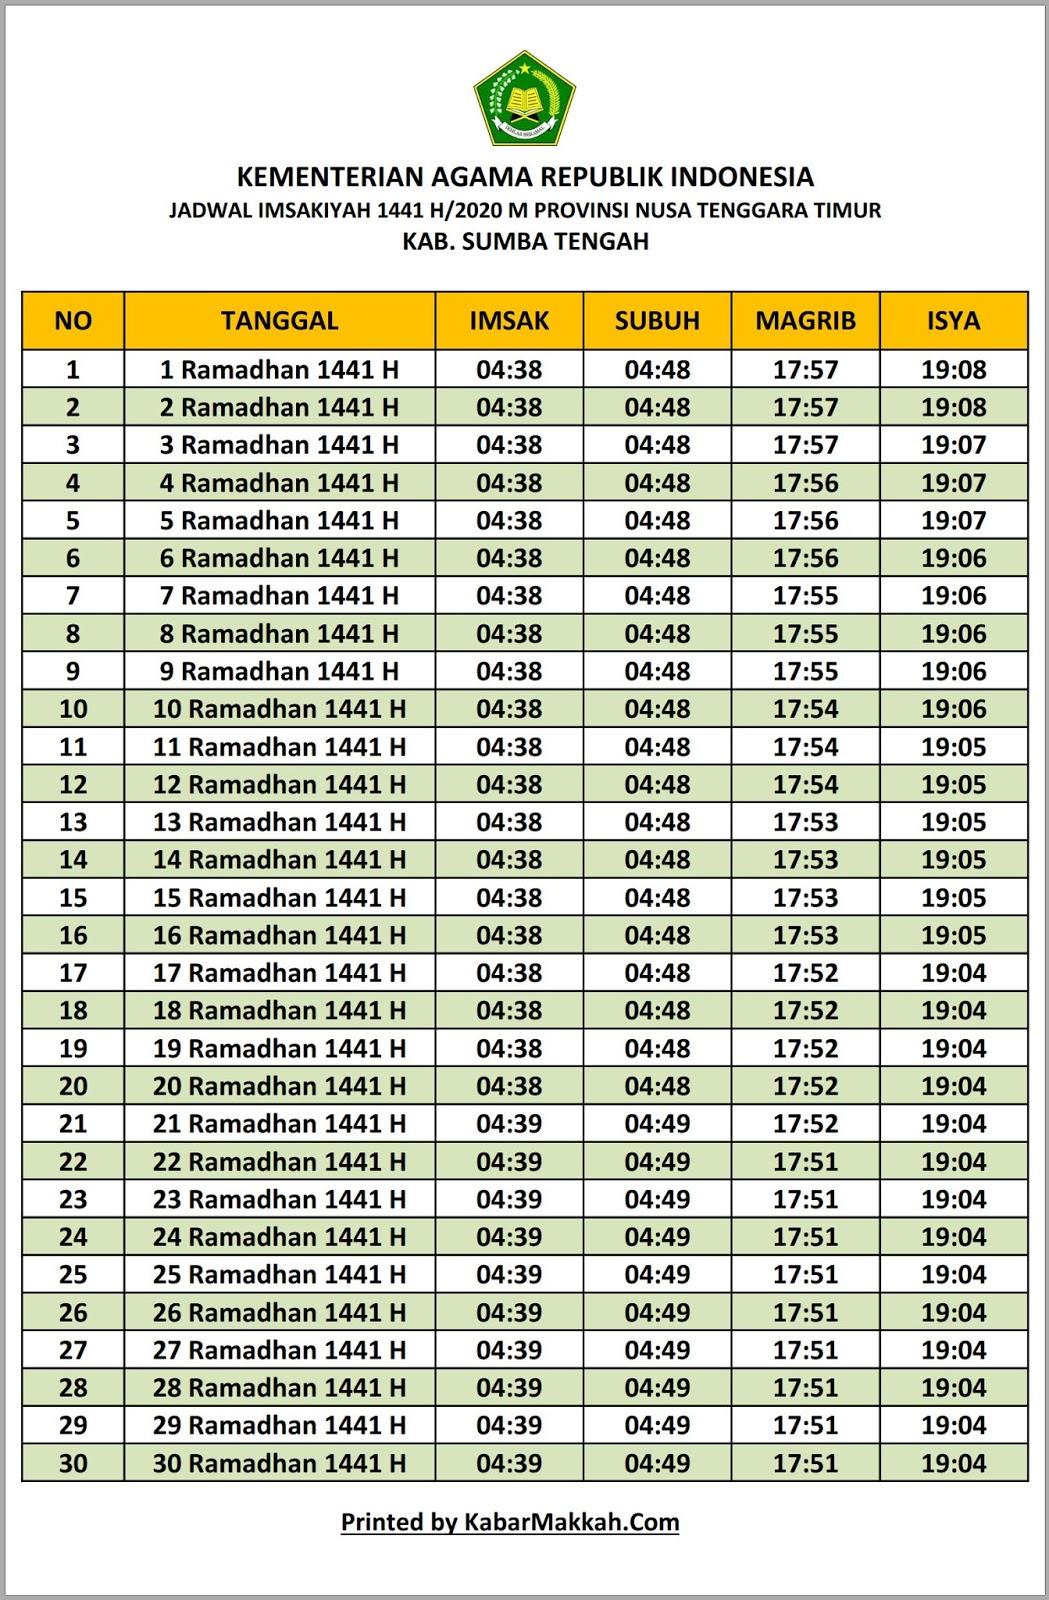 Jadwal Imsakiyah Sumba Tengah 2020